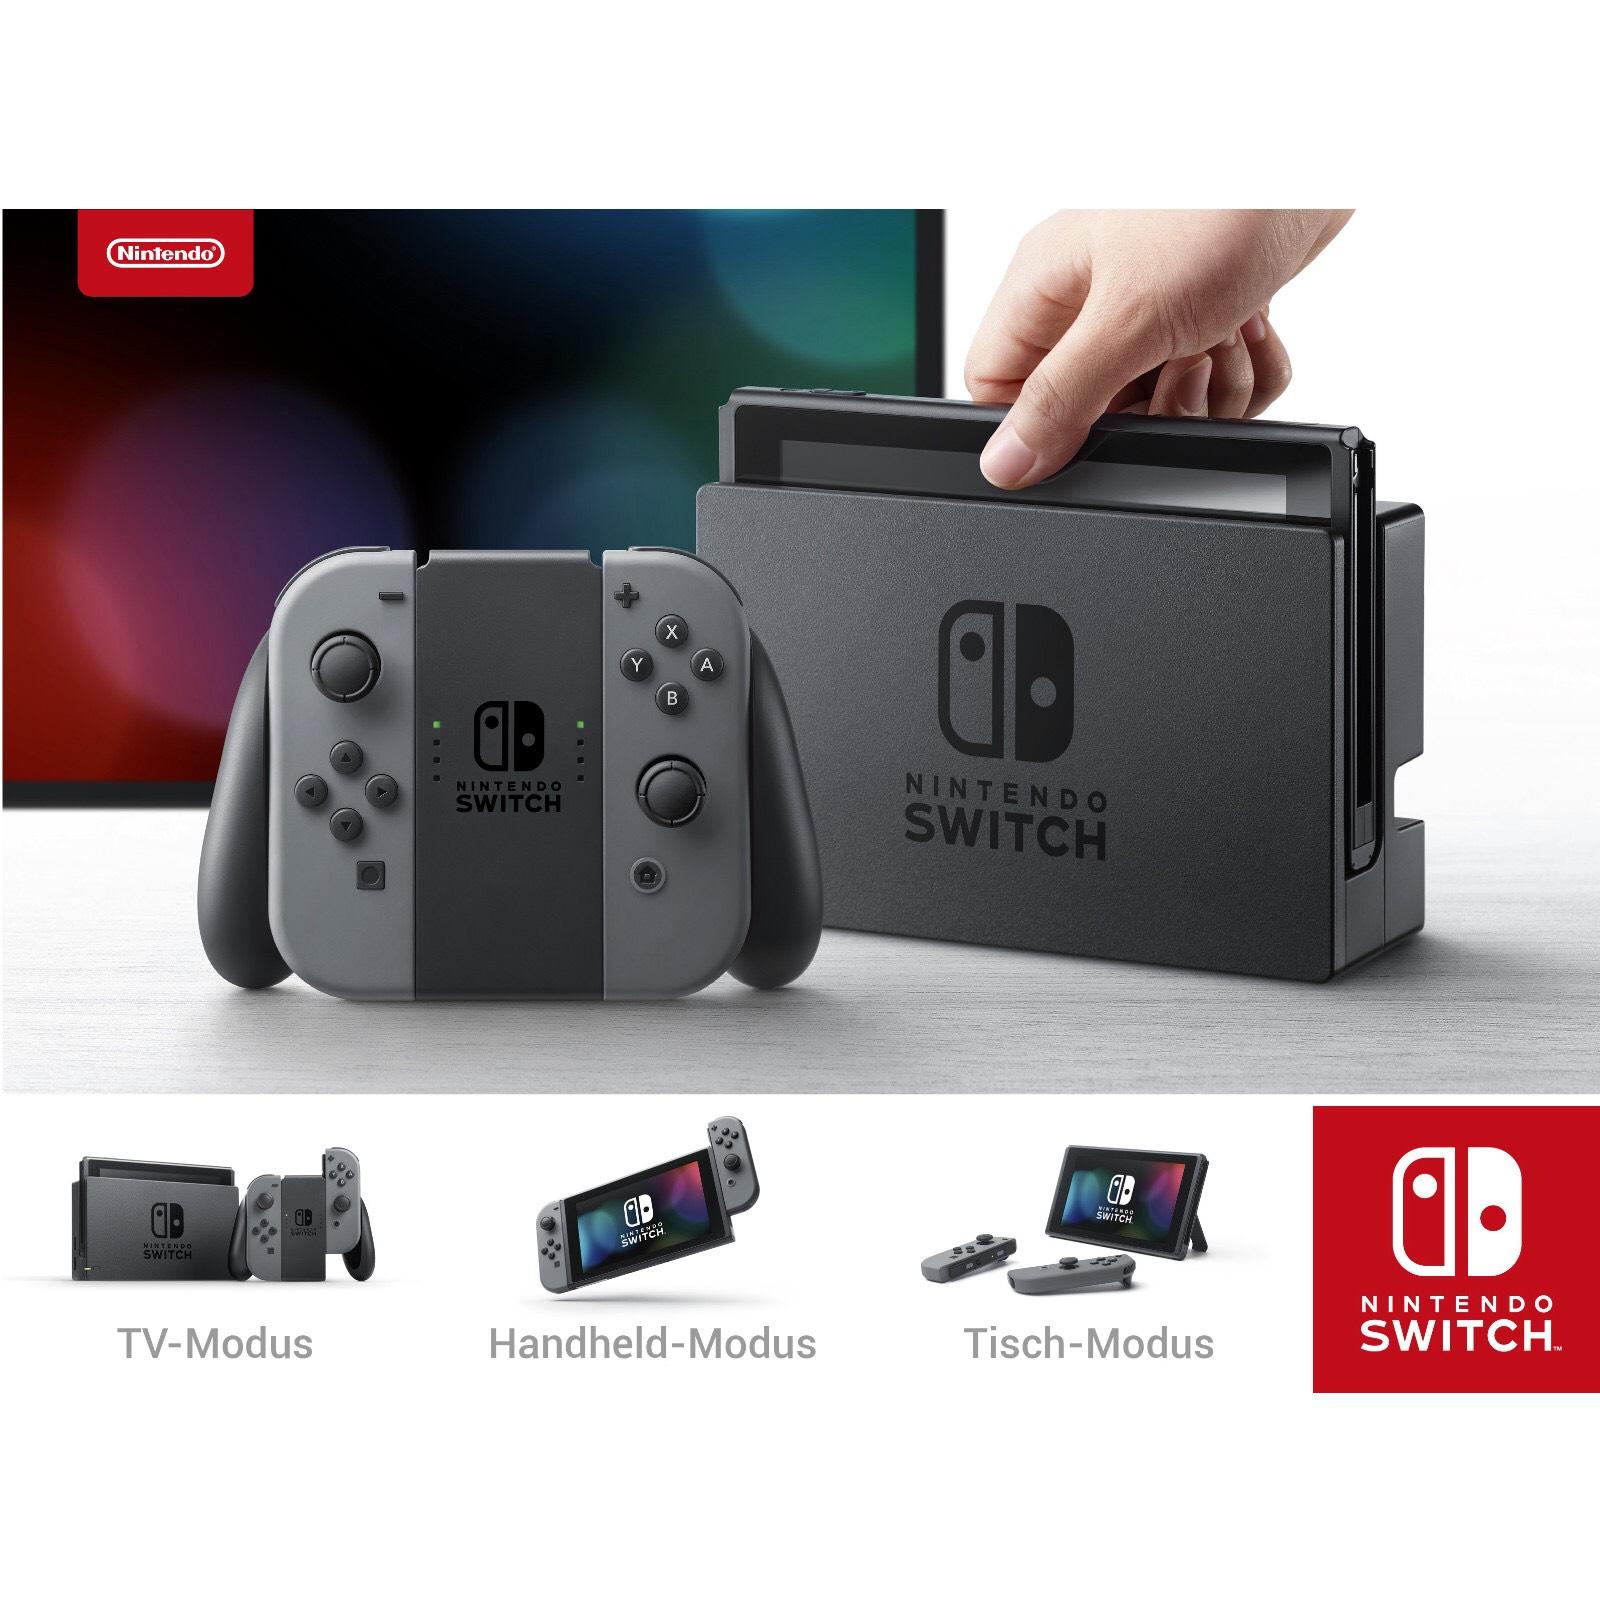 [ebay] Nintendo Switch Konsole NEU + OVP für 242,99€ (mit Umzug nach AU)